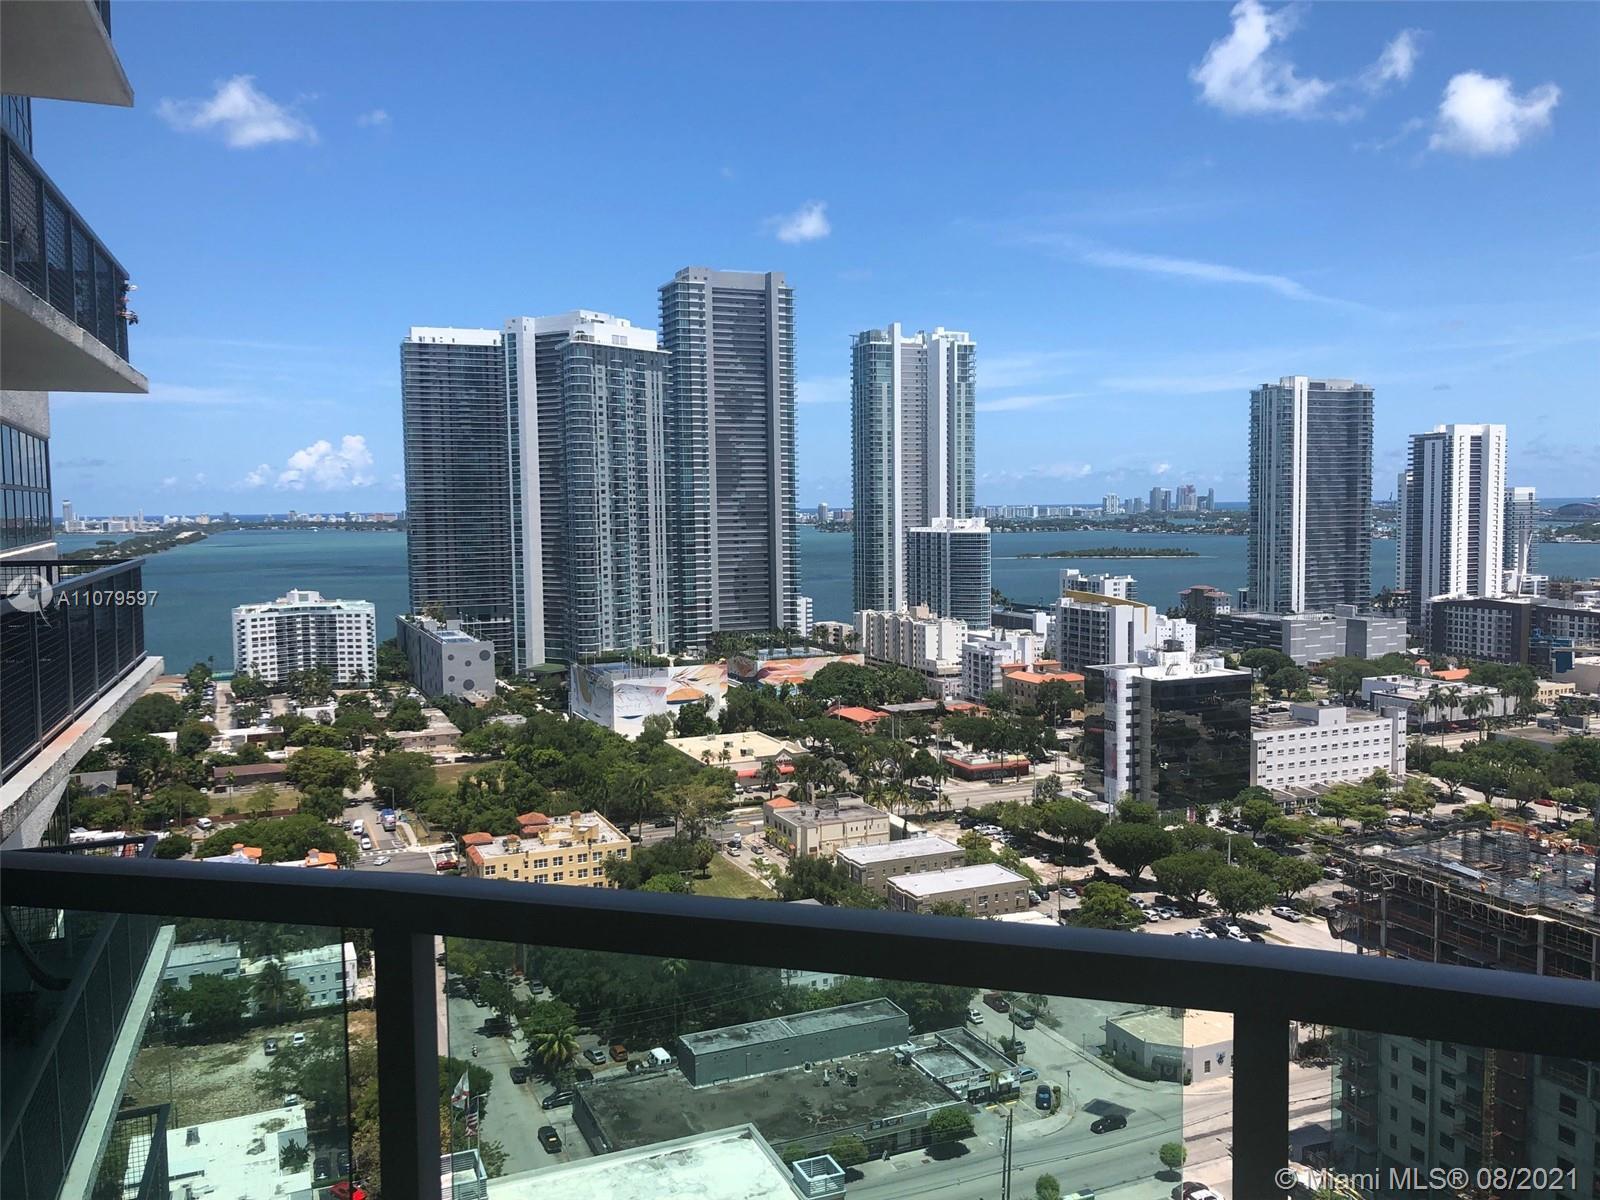 4 Midtown #H2508 - 3301 NE 1st Ave #H2508, Miami, FL 33137